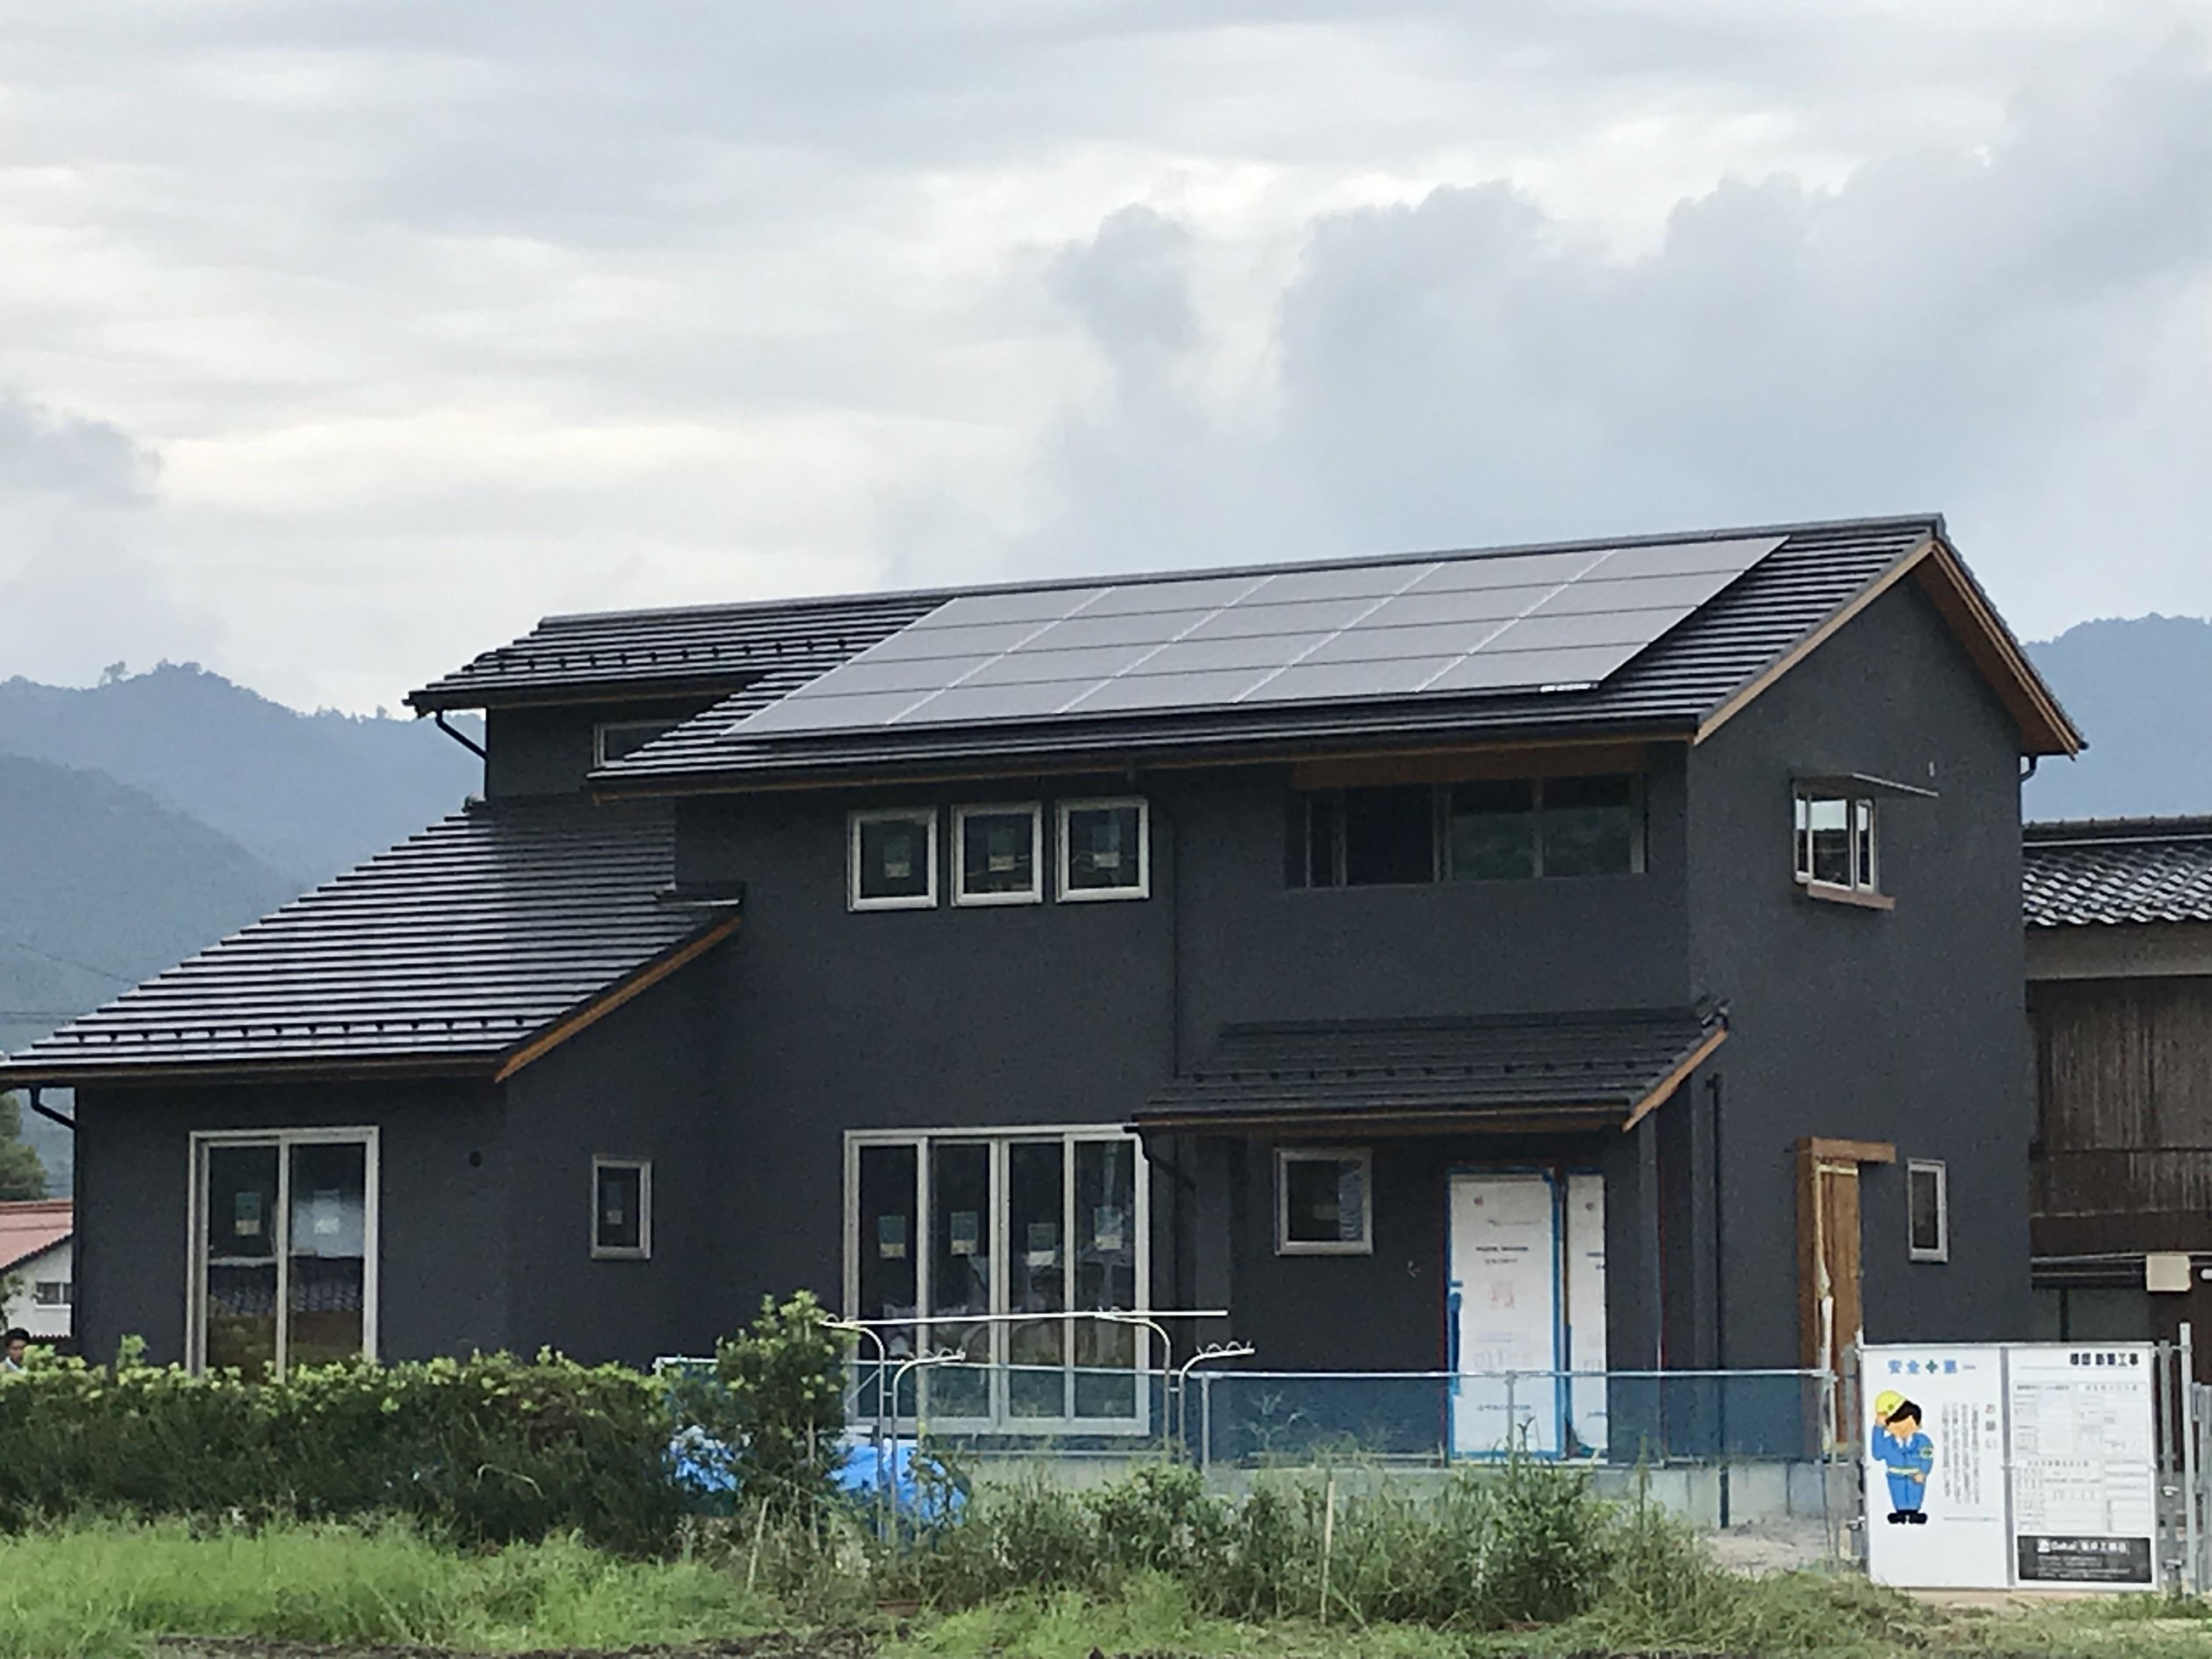 IMG_1260 - 坂井工務店 | 山口県山口市佐山 | 木造住宅、注文住宅の工務店